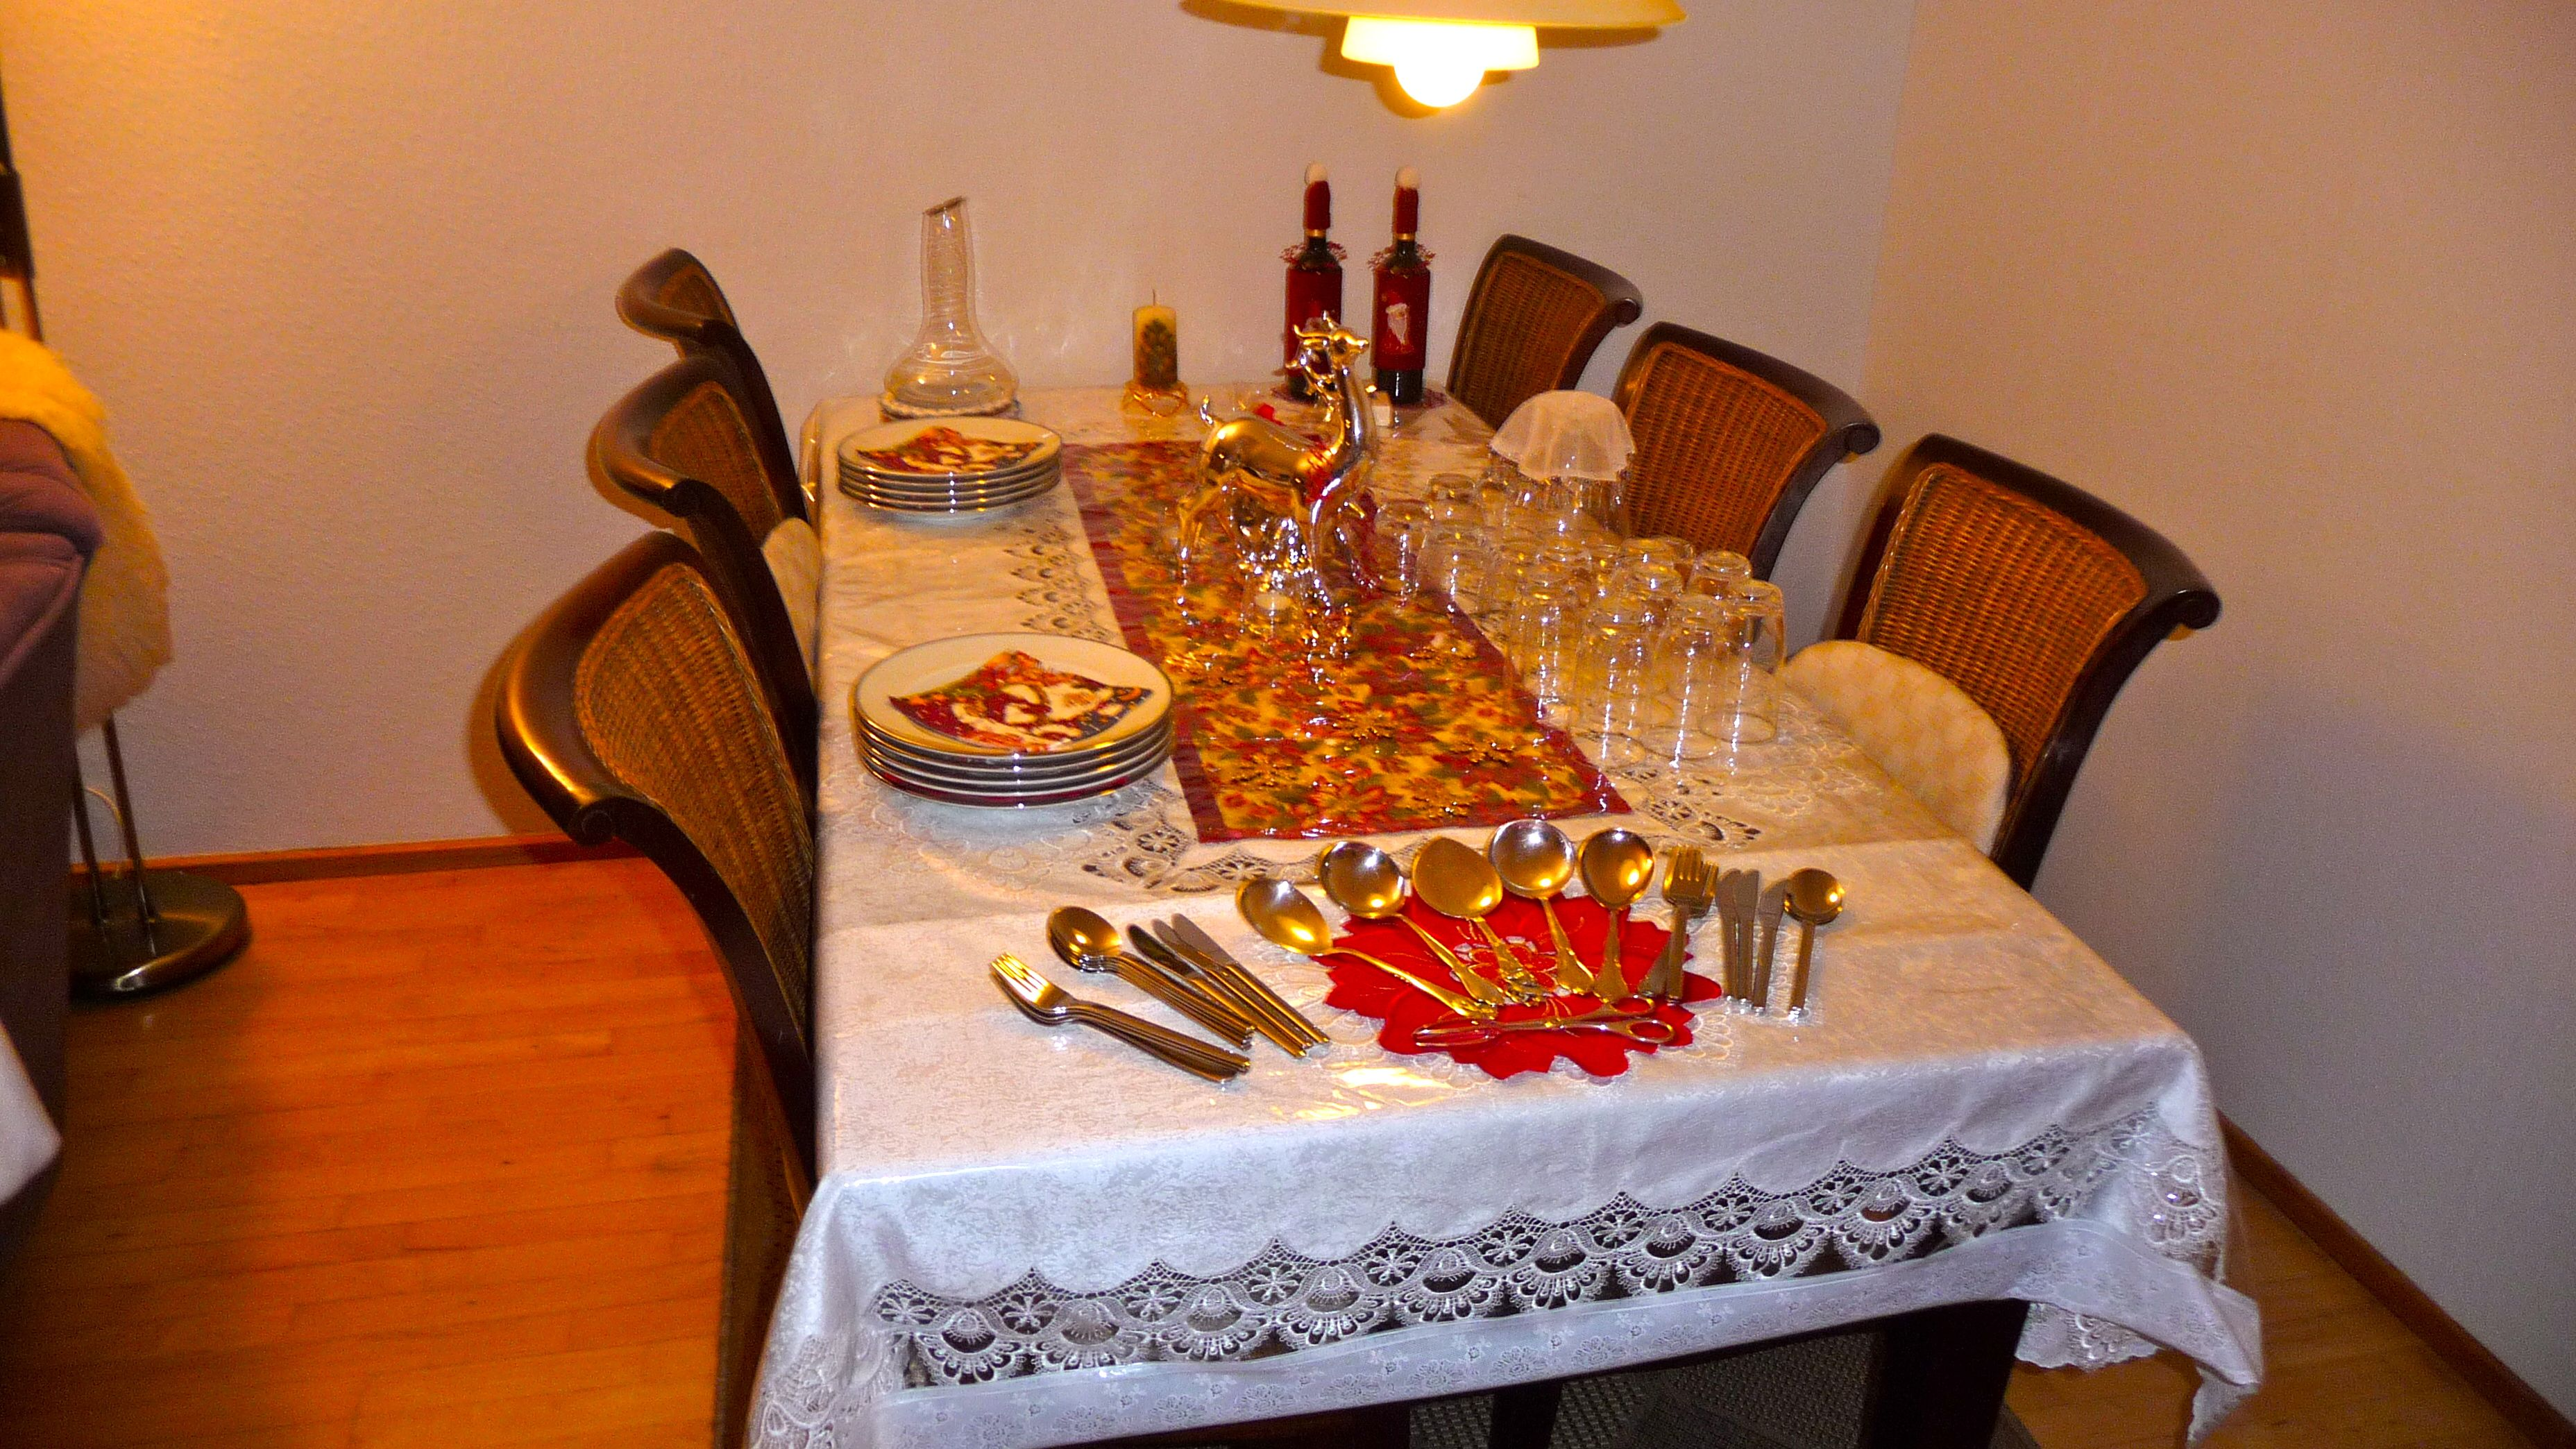 Christmas Buffet Table Setting 2012 Everything Beautiful